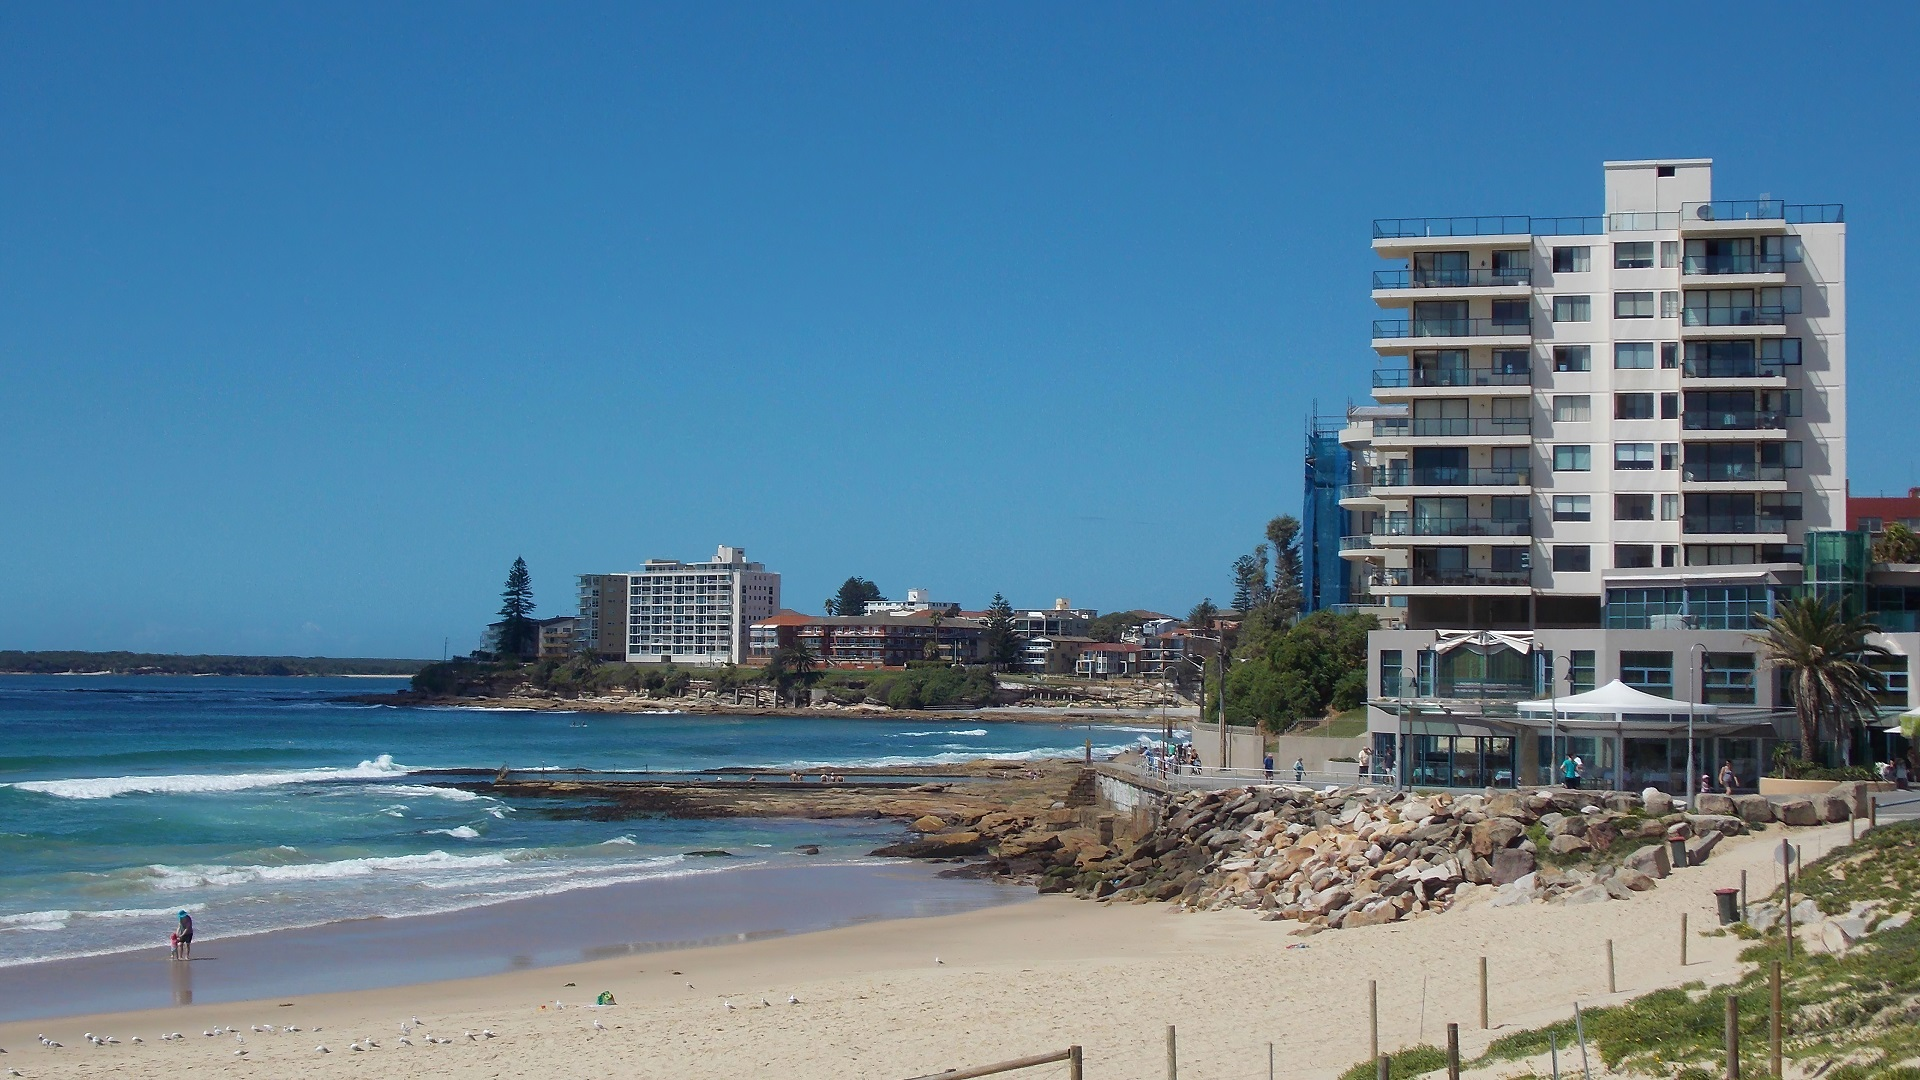 Wallpapers Id 359516 Next Wallpaper Prev Cronulla Beach Sydney Australia